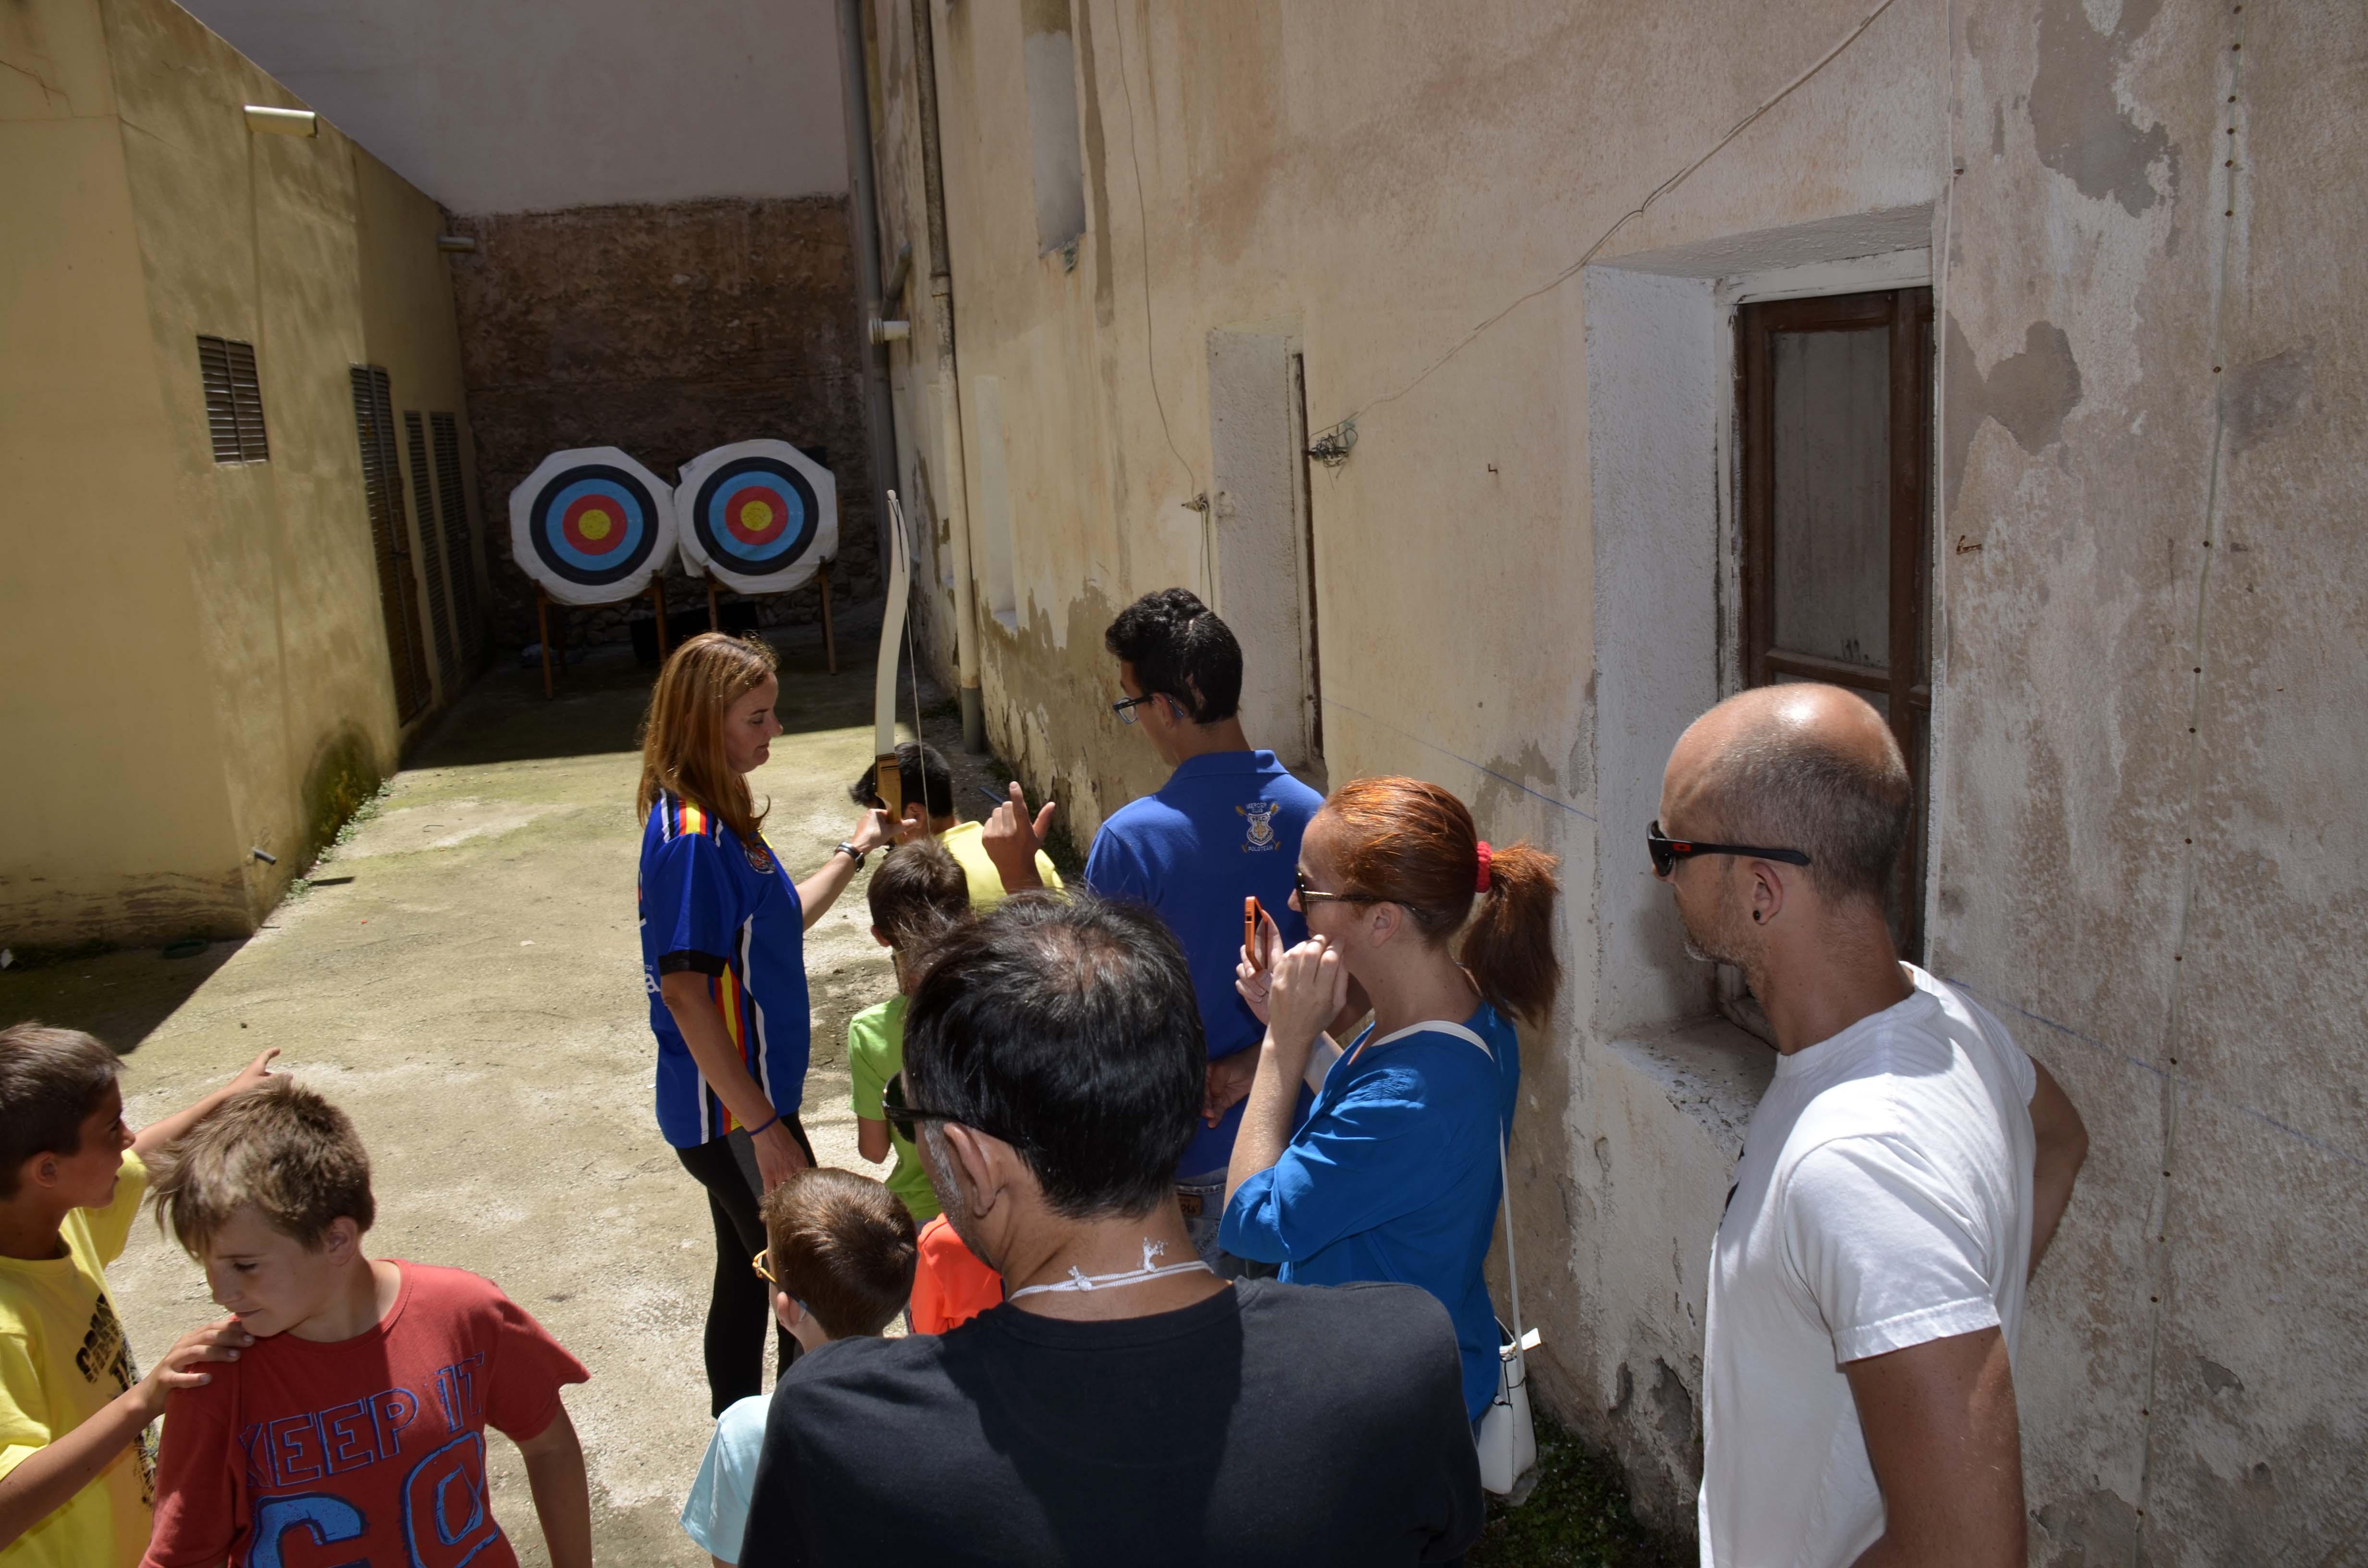 2015-05-31 DEPORTE EN LA CALLE PASEO (32)